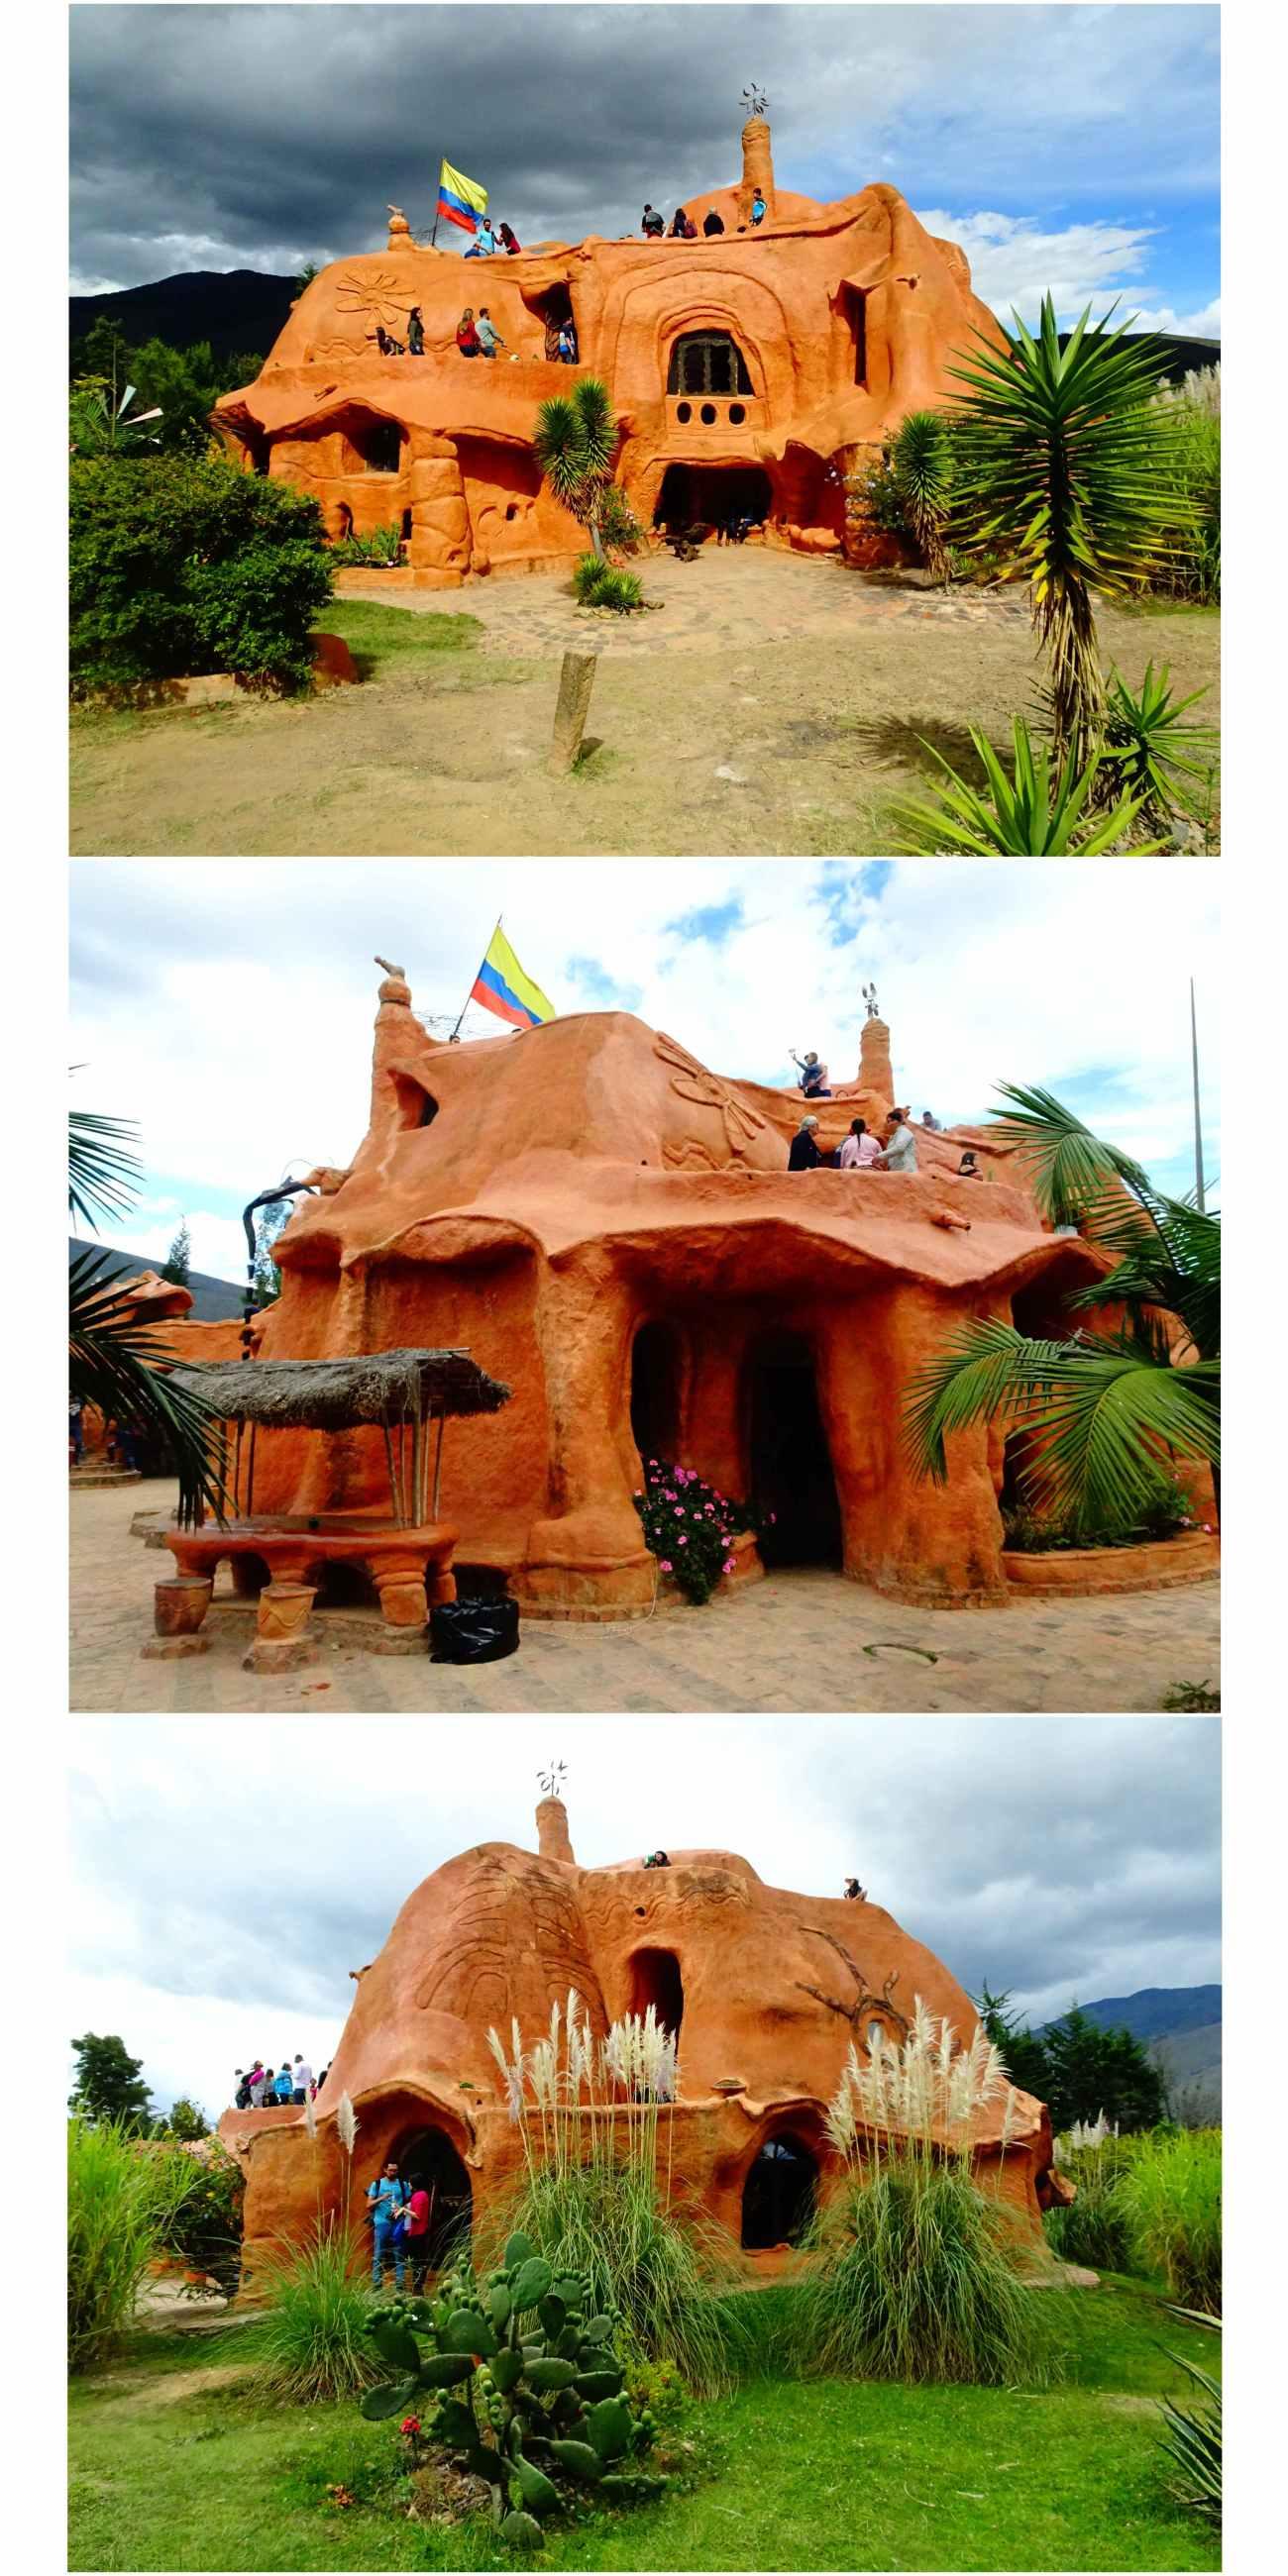 Casa terracotta entier